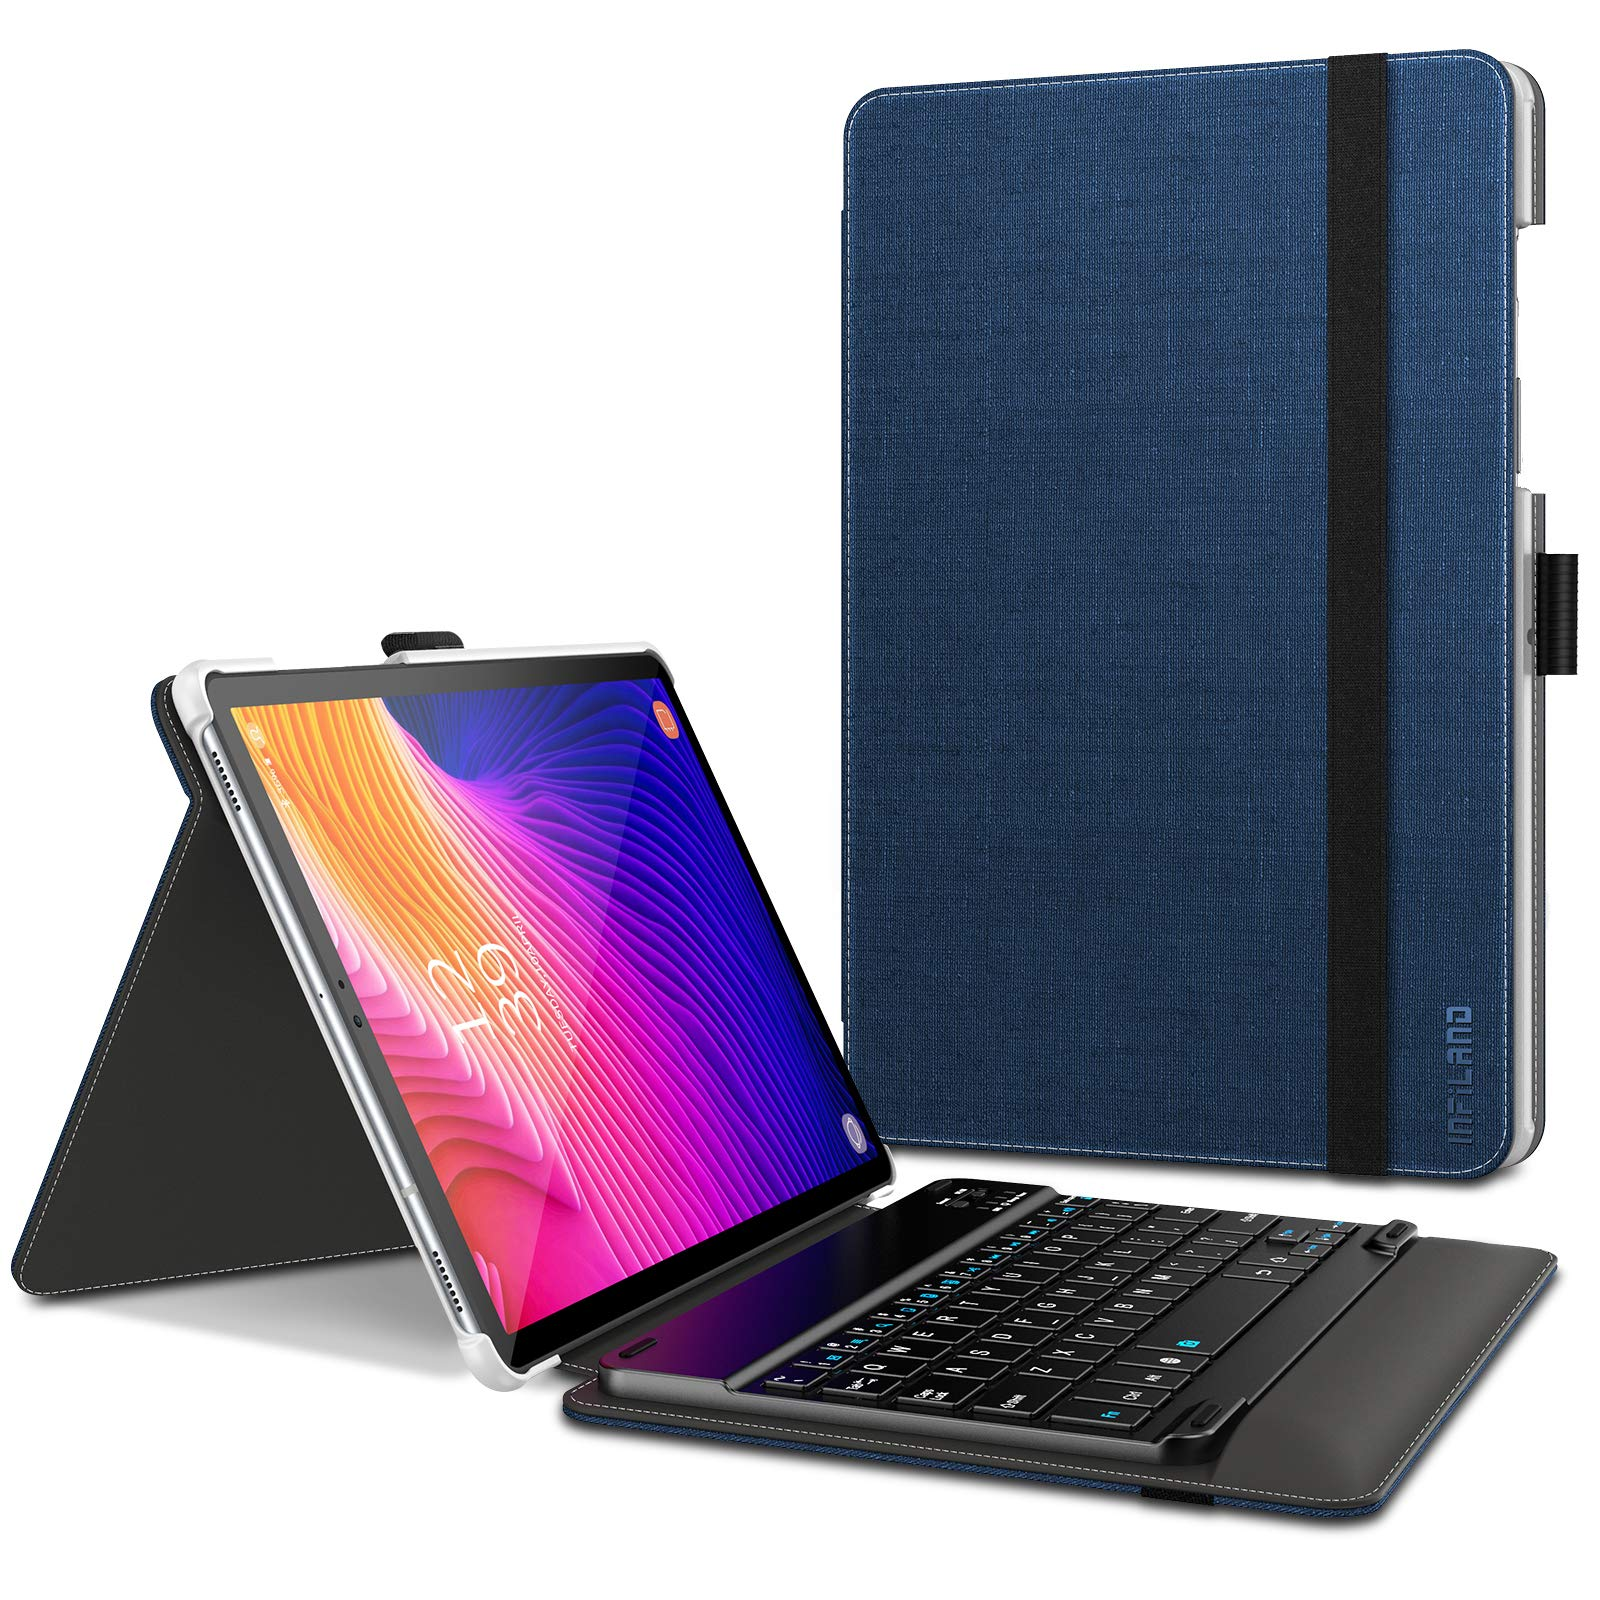 Funda + Teclado Galaxy Tab S5e Infiland [7t3lds4w]